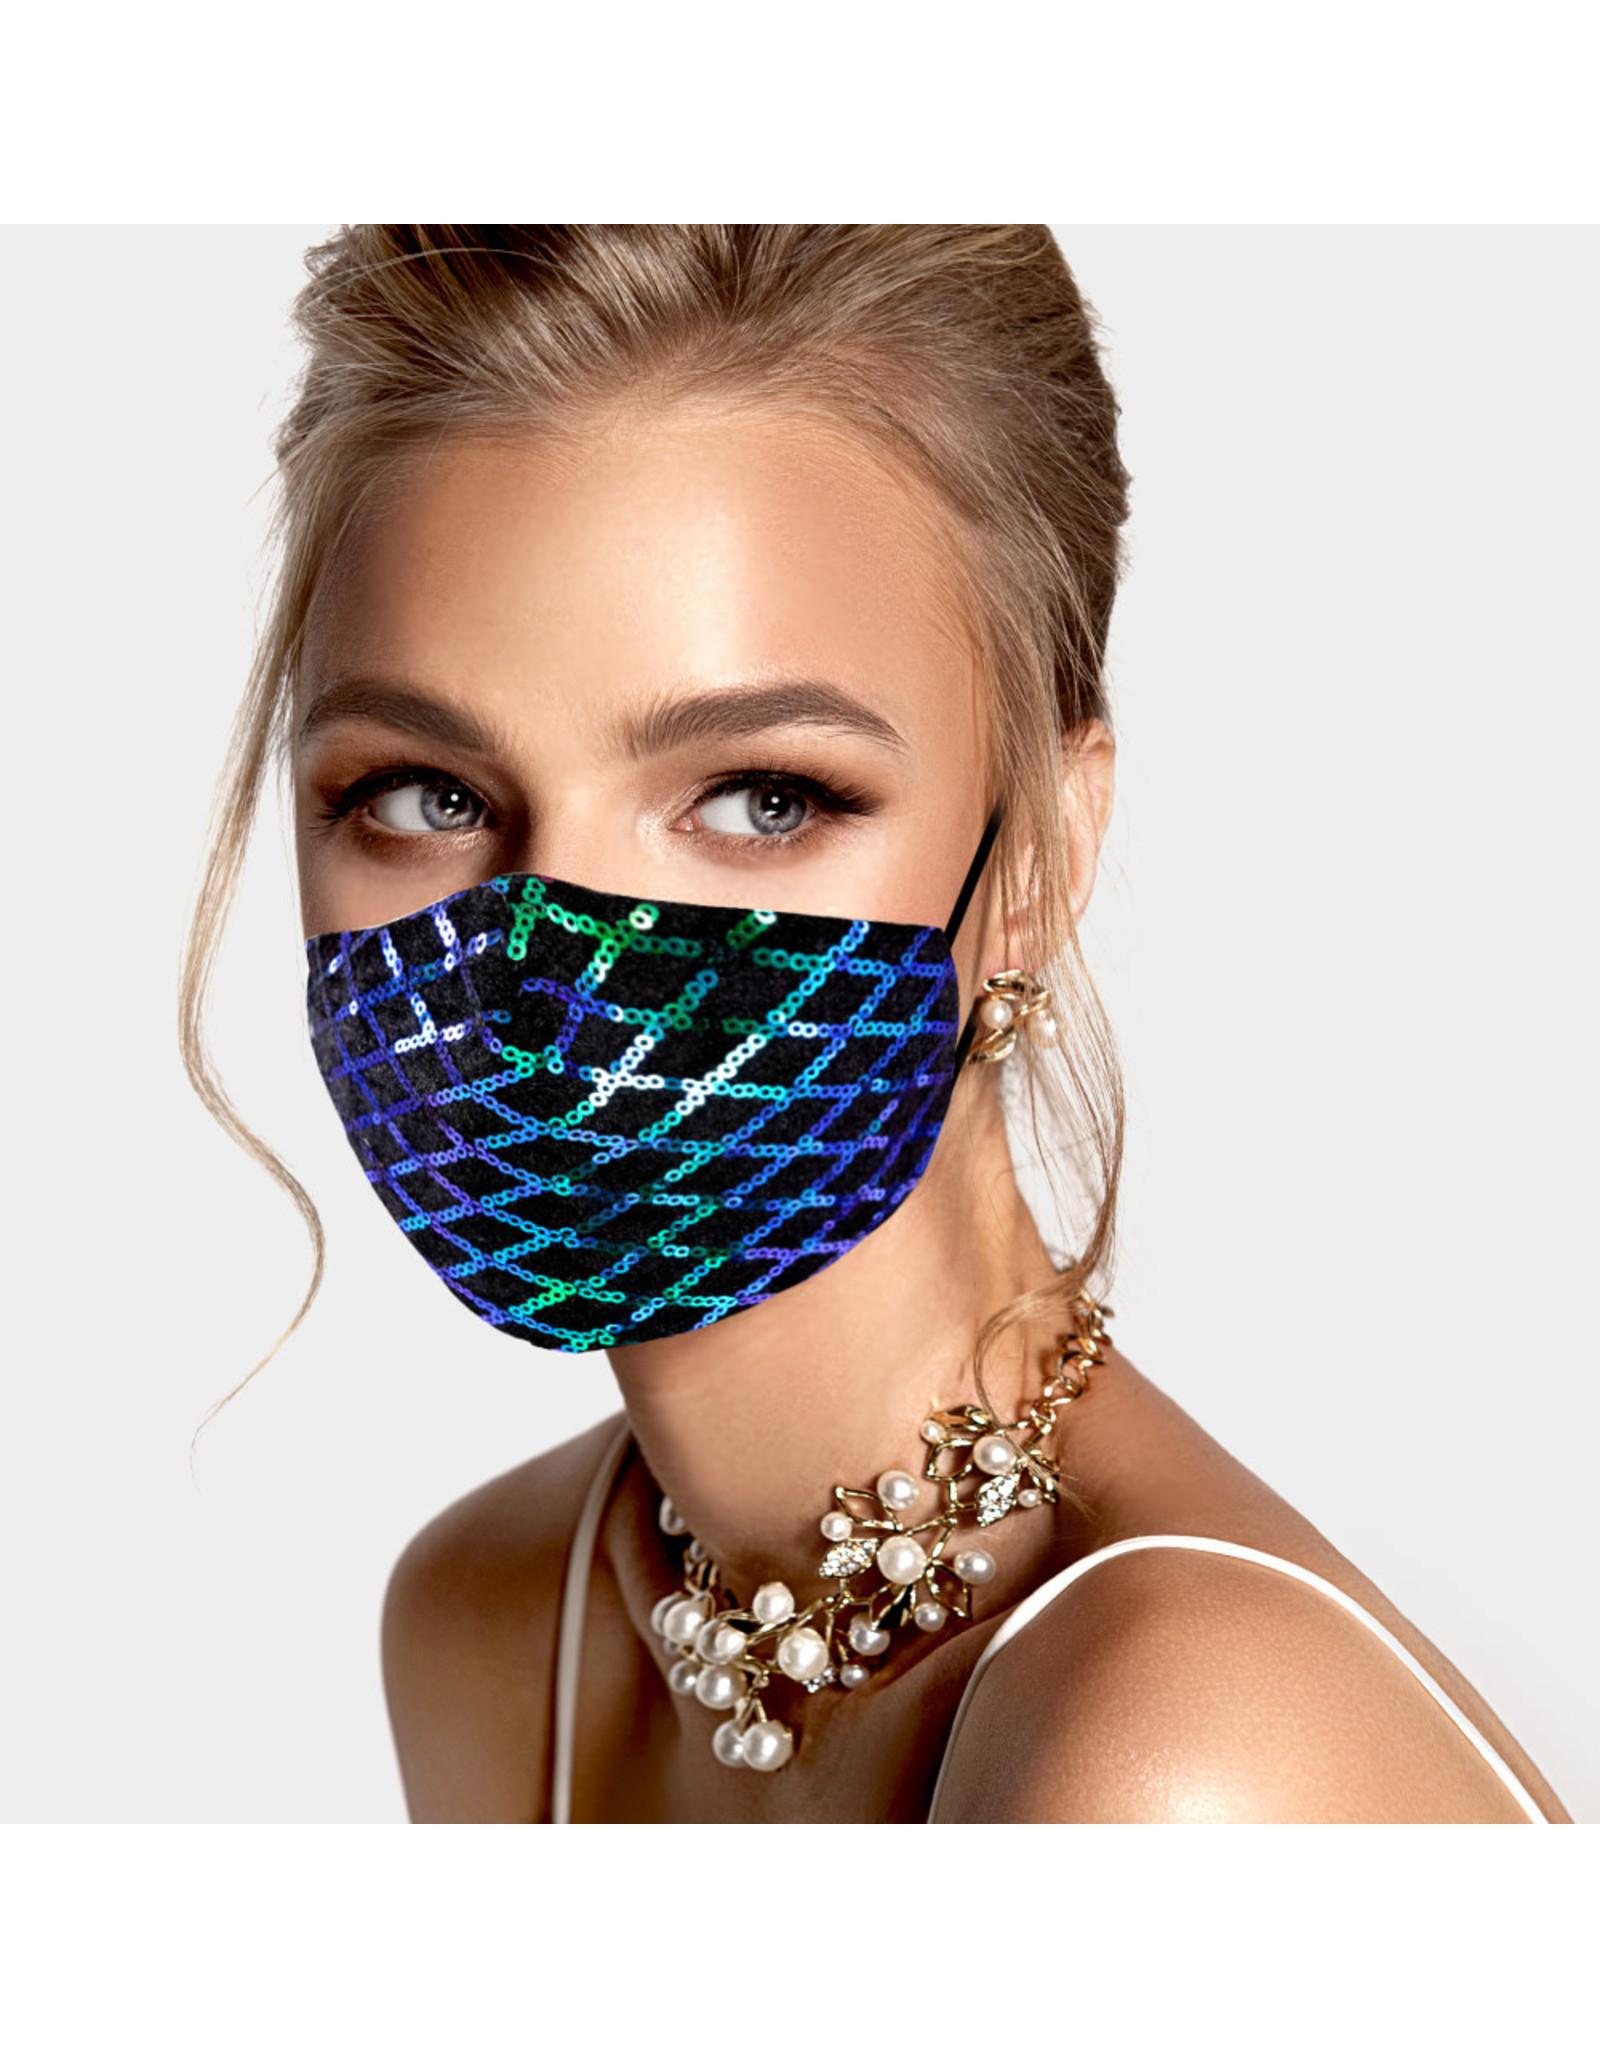 Teal Sequin Mask